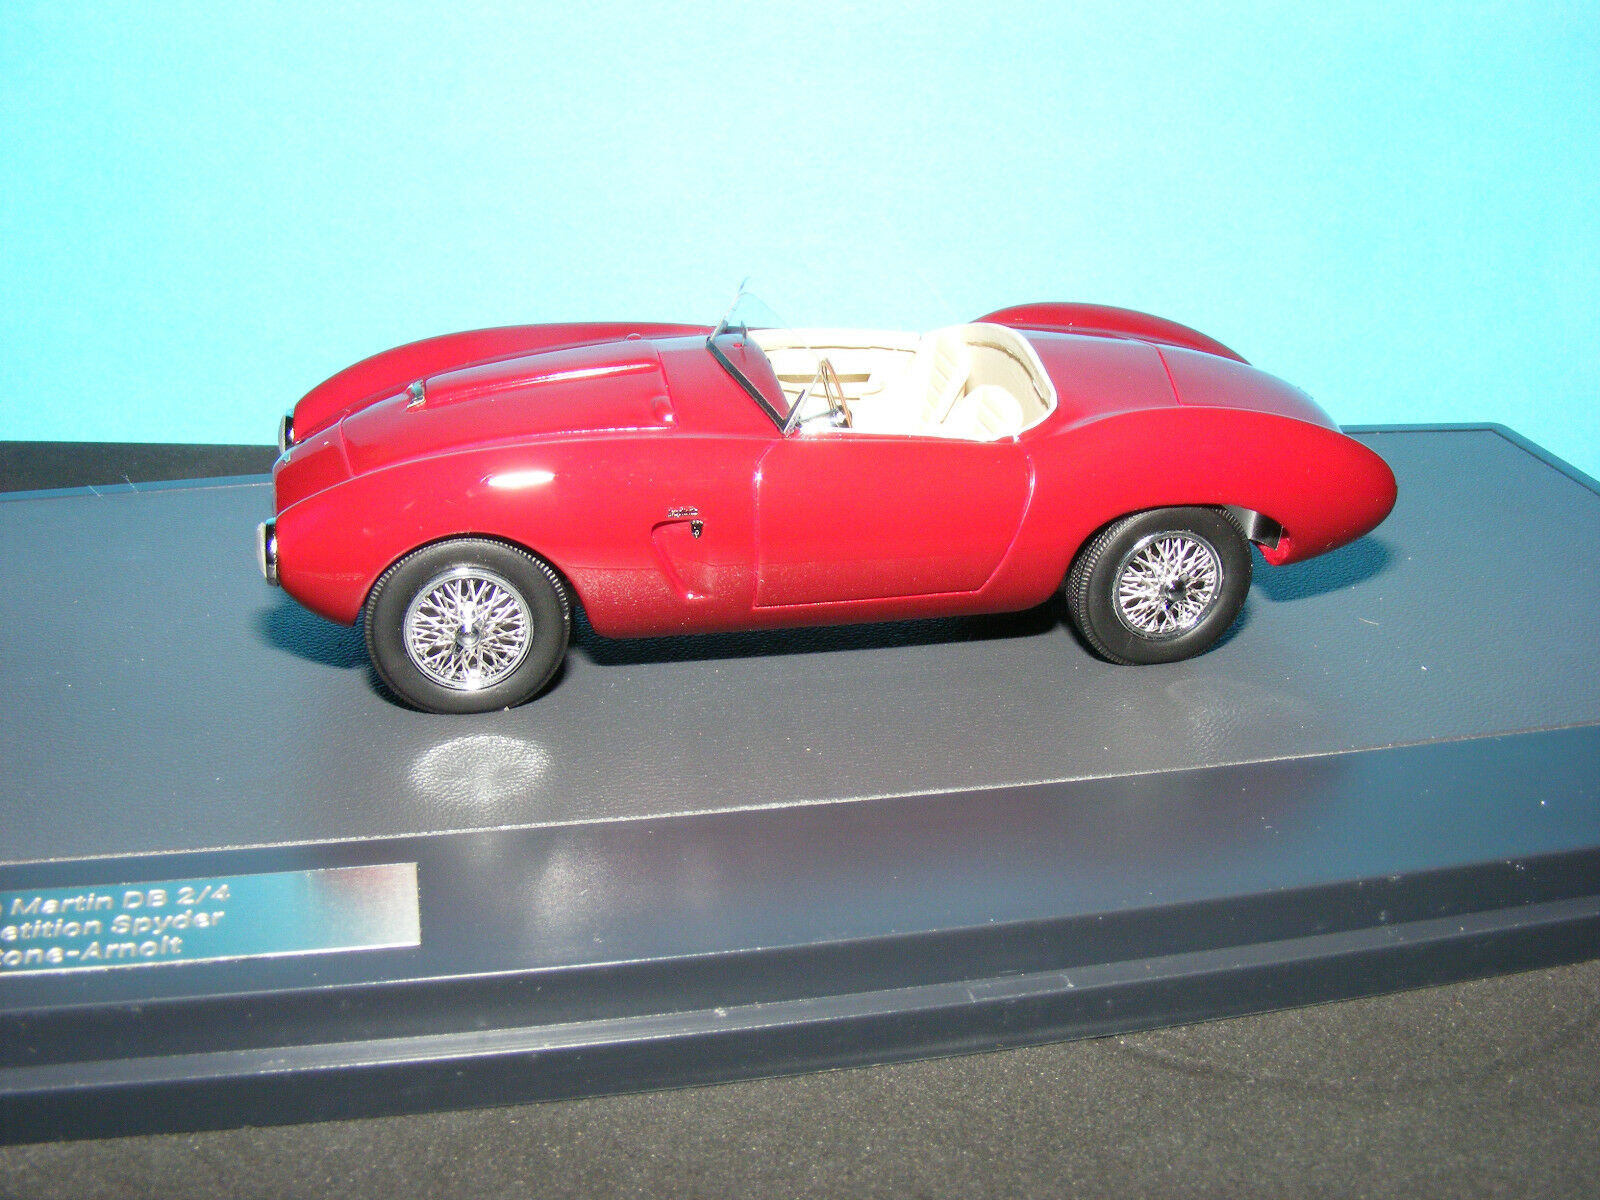 Aston Martin DB2 4 competencia Spyder Bertone-ARNOLT 1954 1 43 nla modelo de matriz